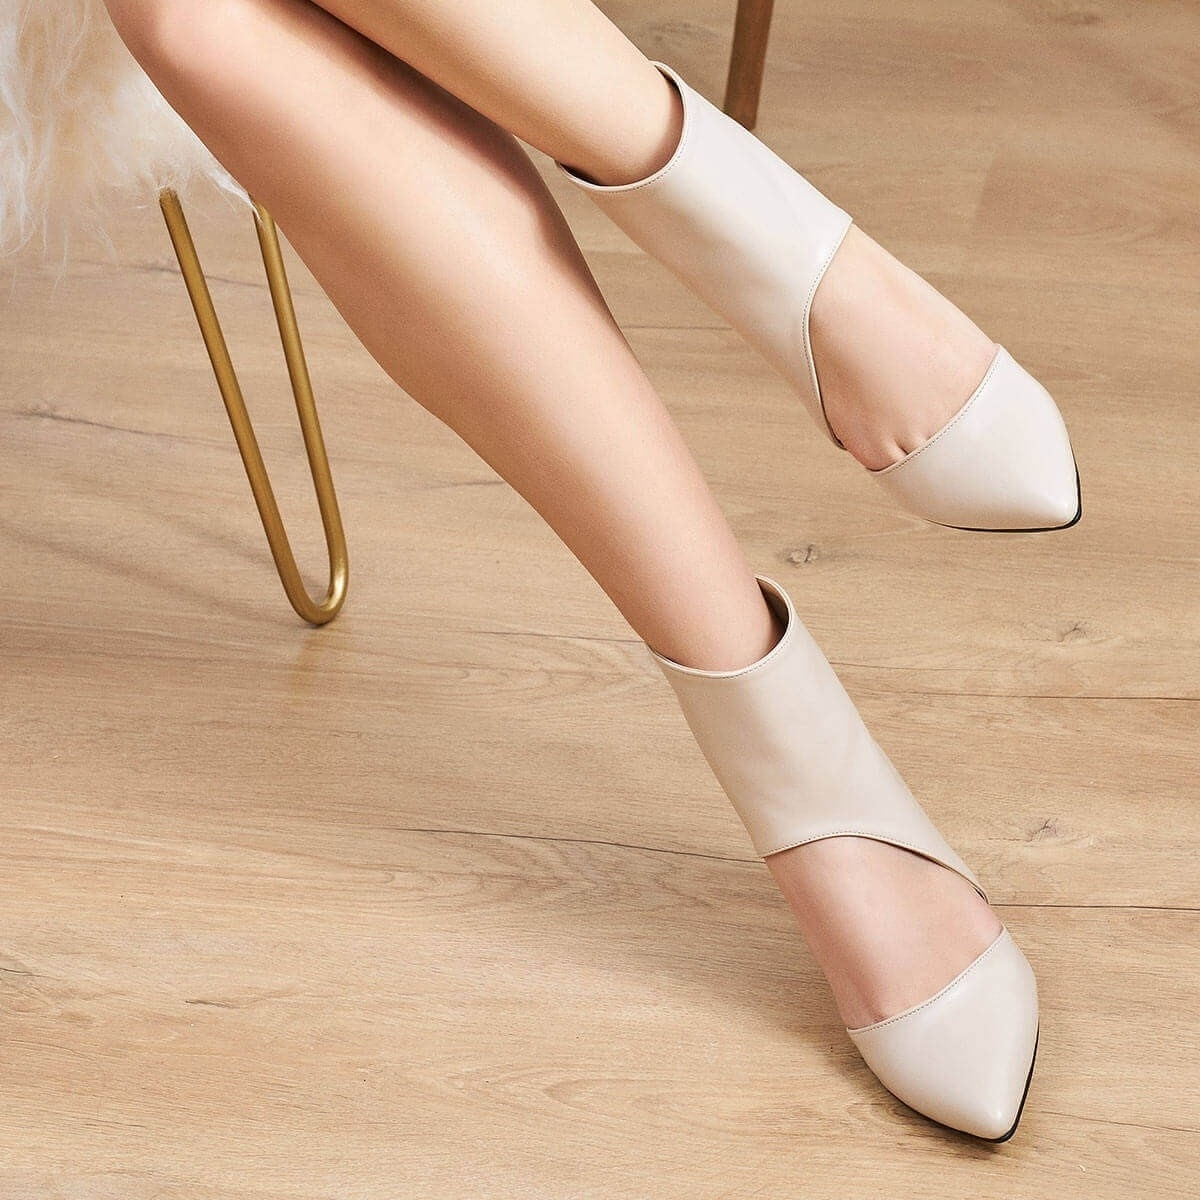 Mio Gusto-حذاء نسائي بكعب عال 8 سنتيمتر ، حذاء بكعب منخفض ، لون أسود وبني ، ماركة Sasha